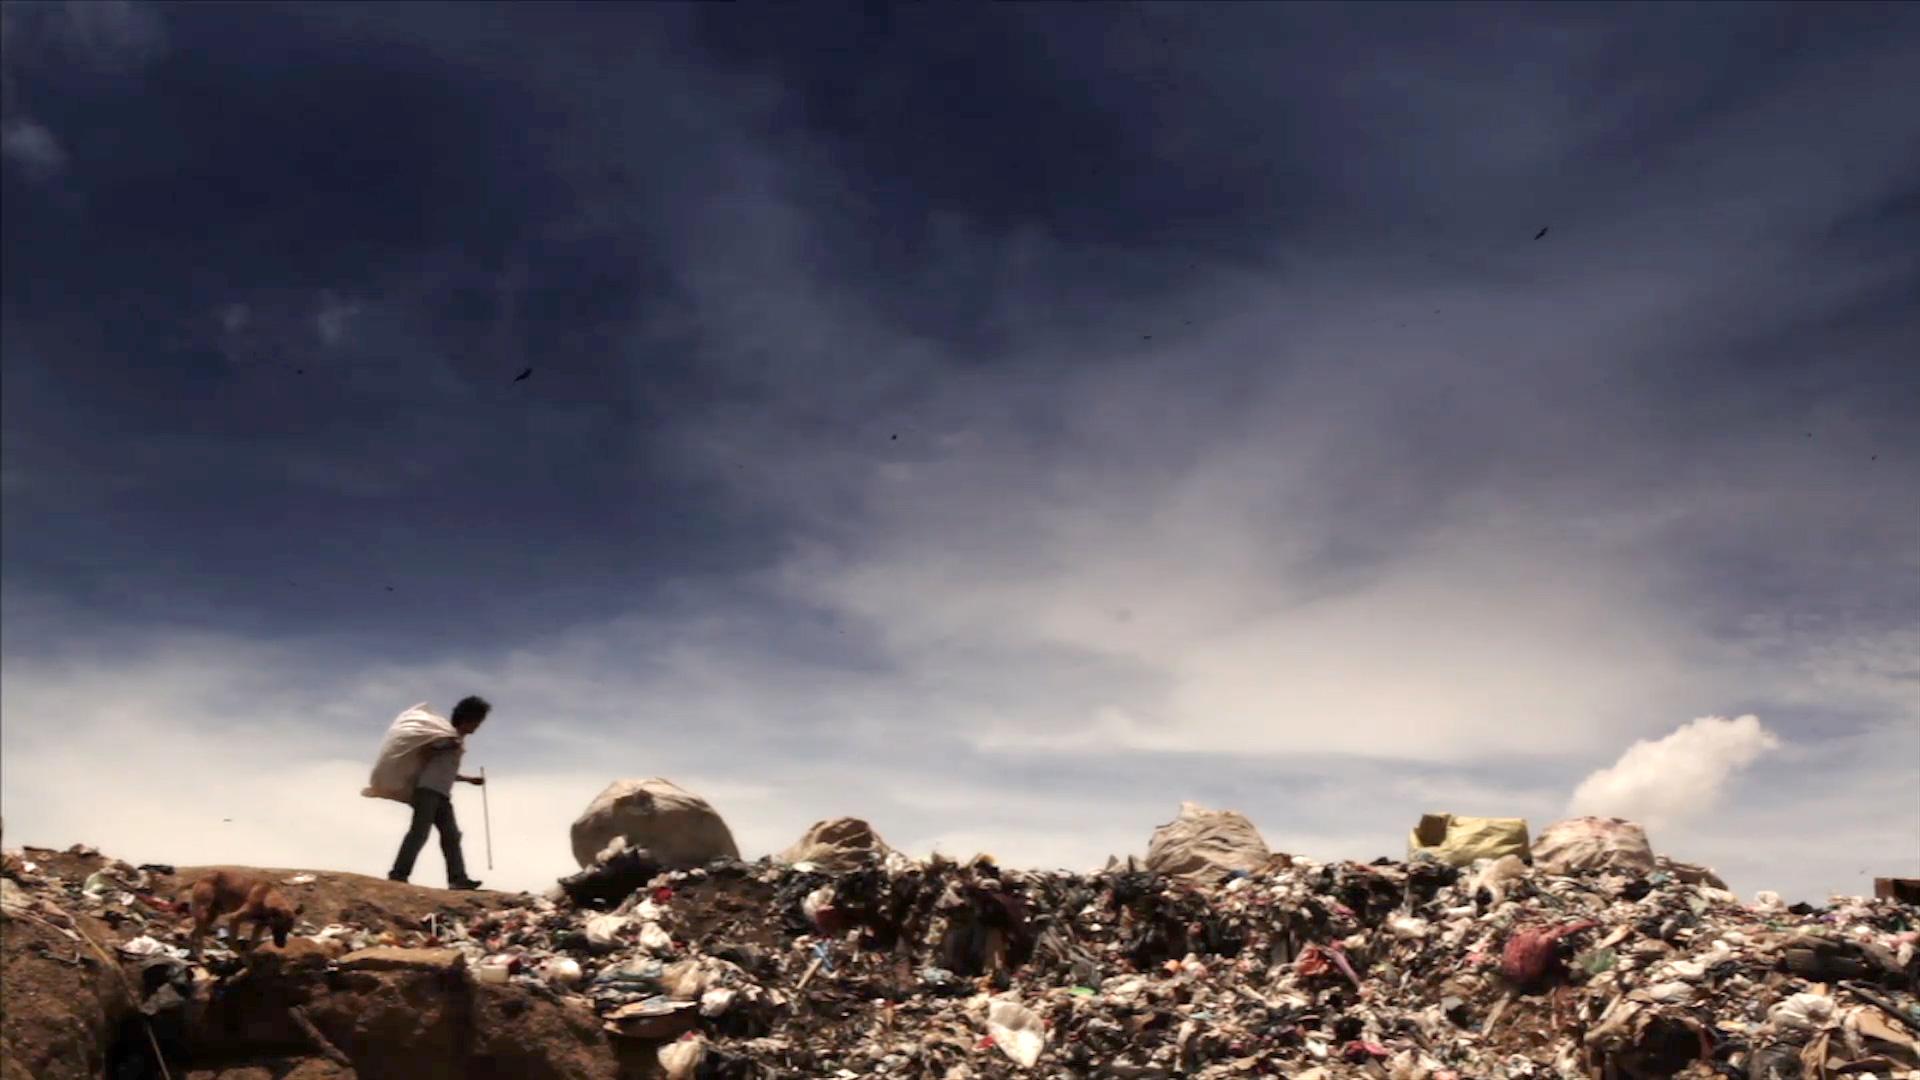 Scavenger walking through the dump.